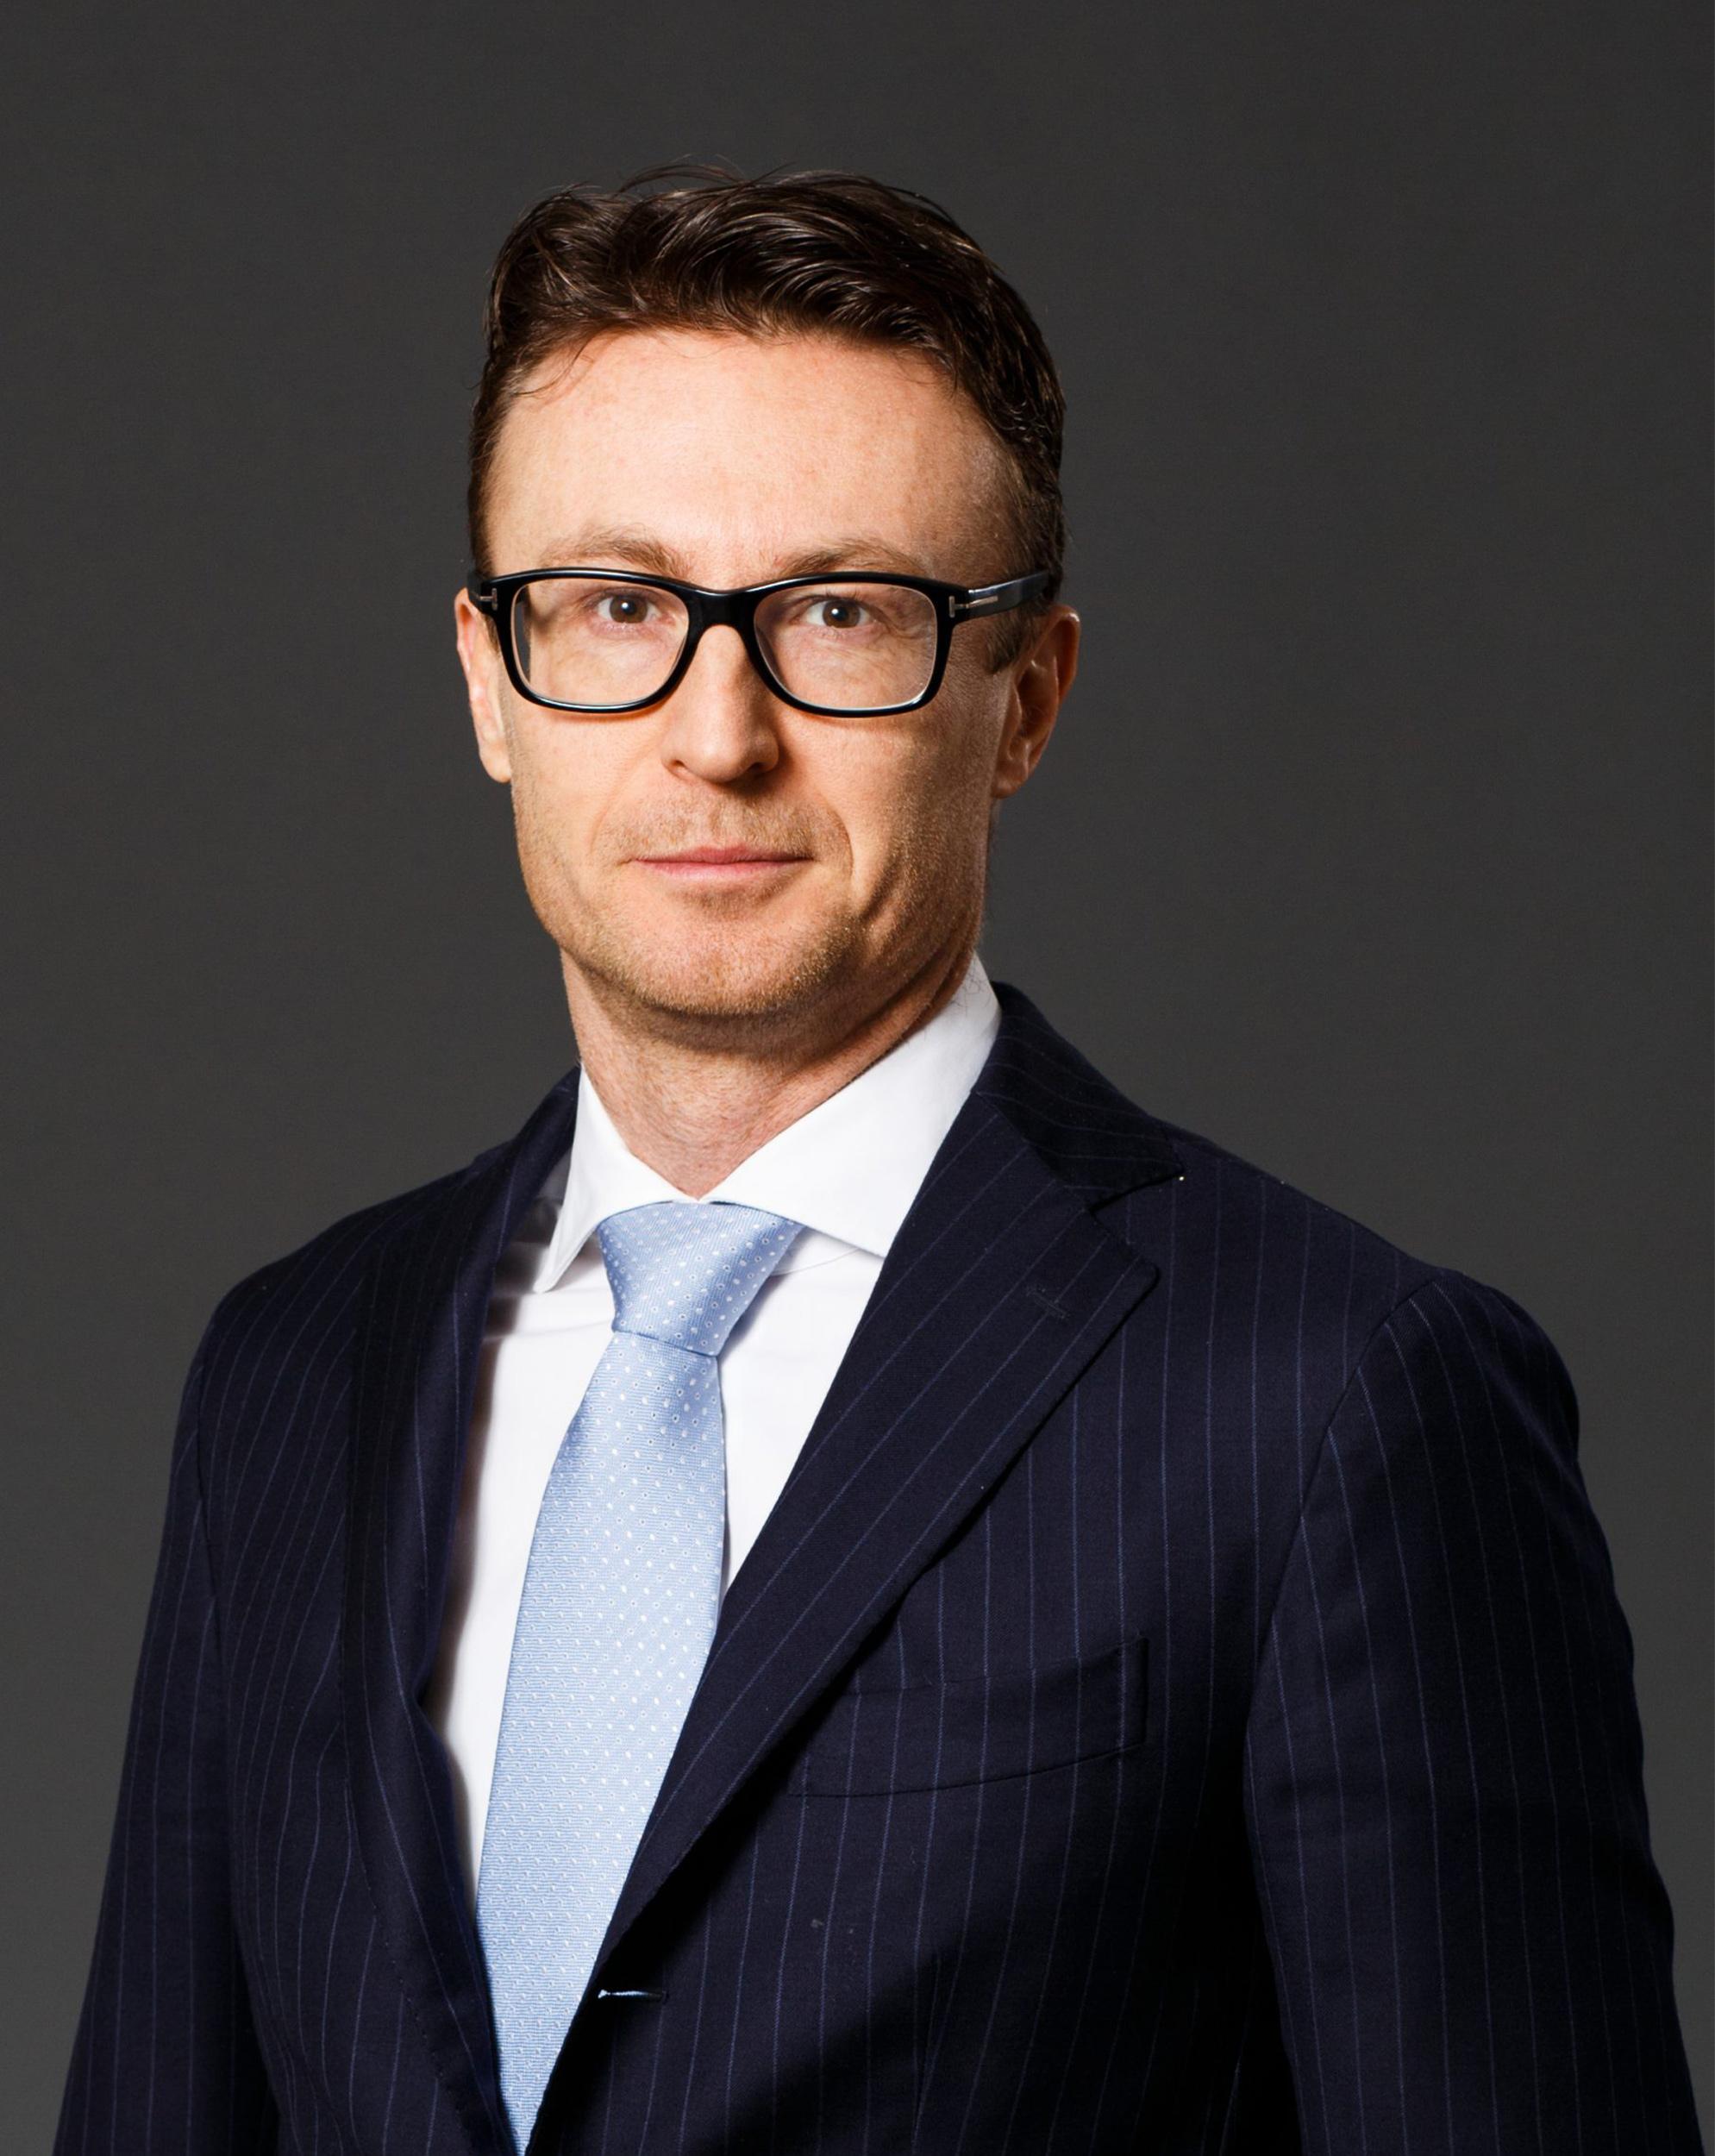 Jakob Ragnwaldh